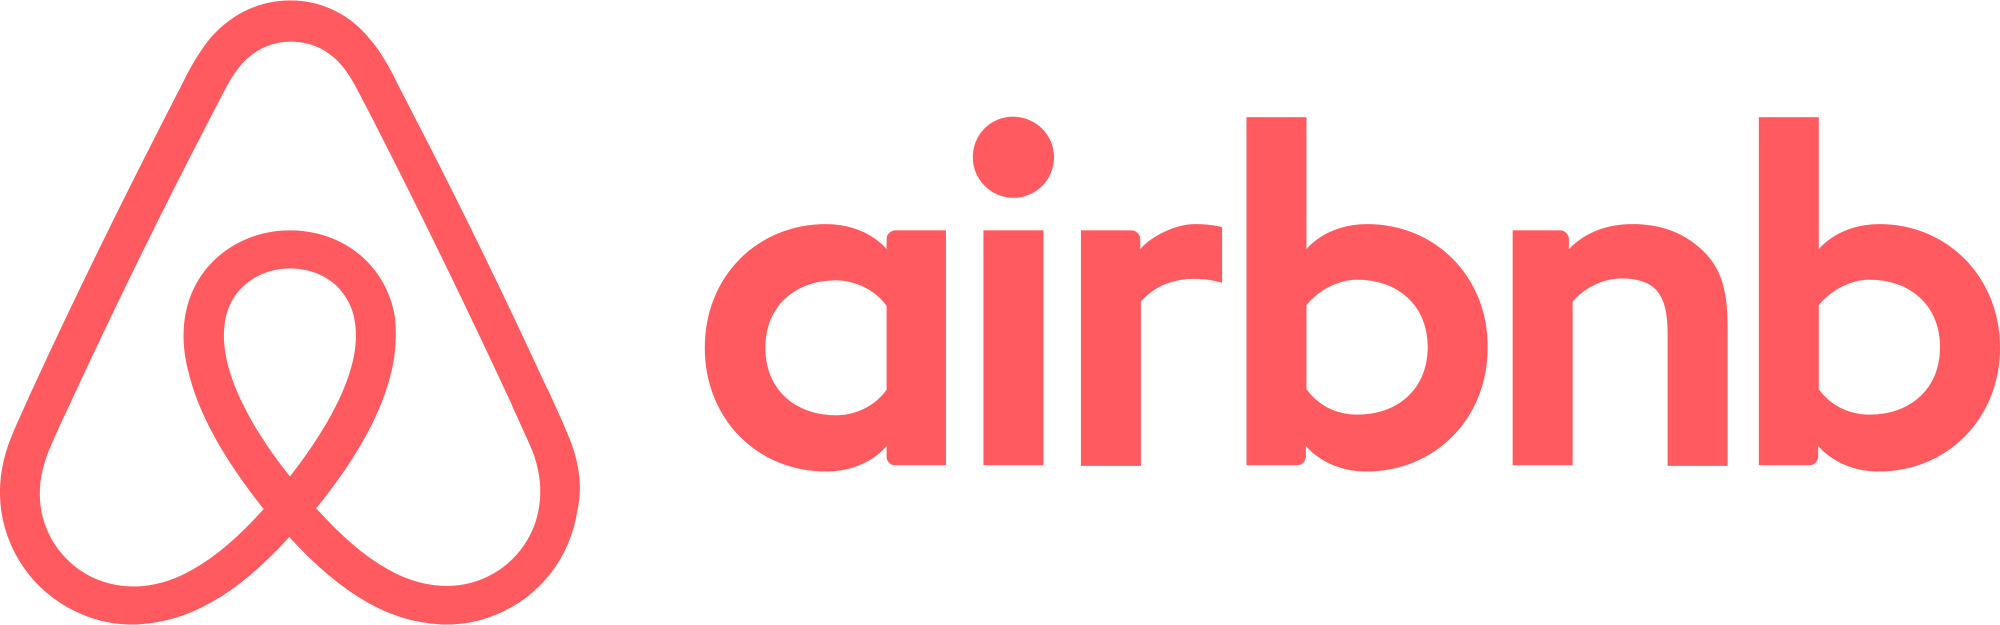 Open PlusPng.com  - Airbnb Logo PNG